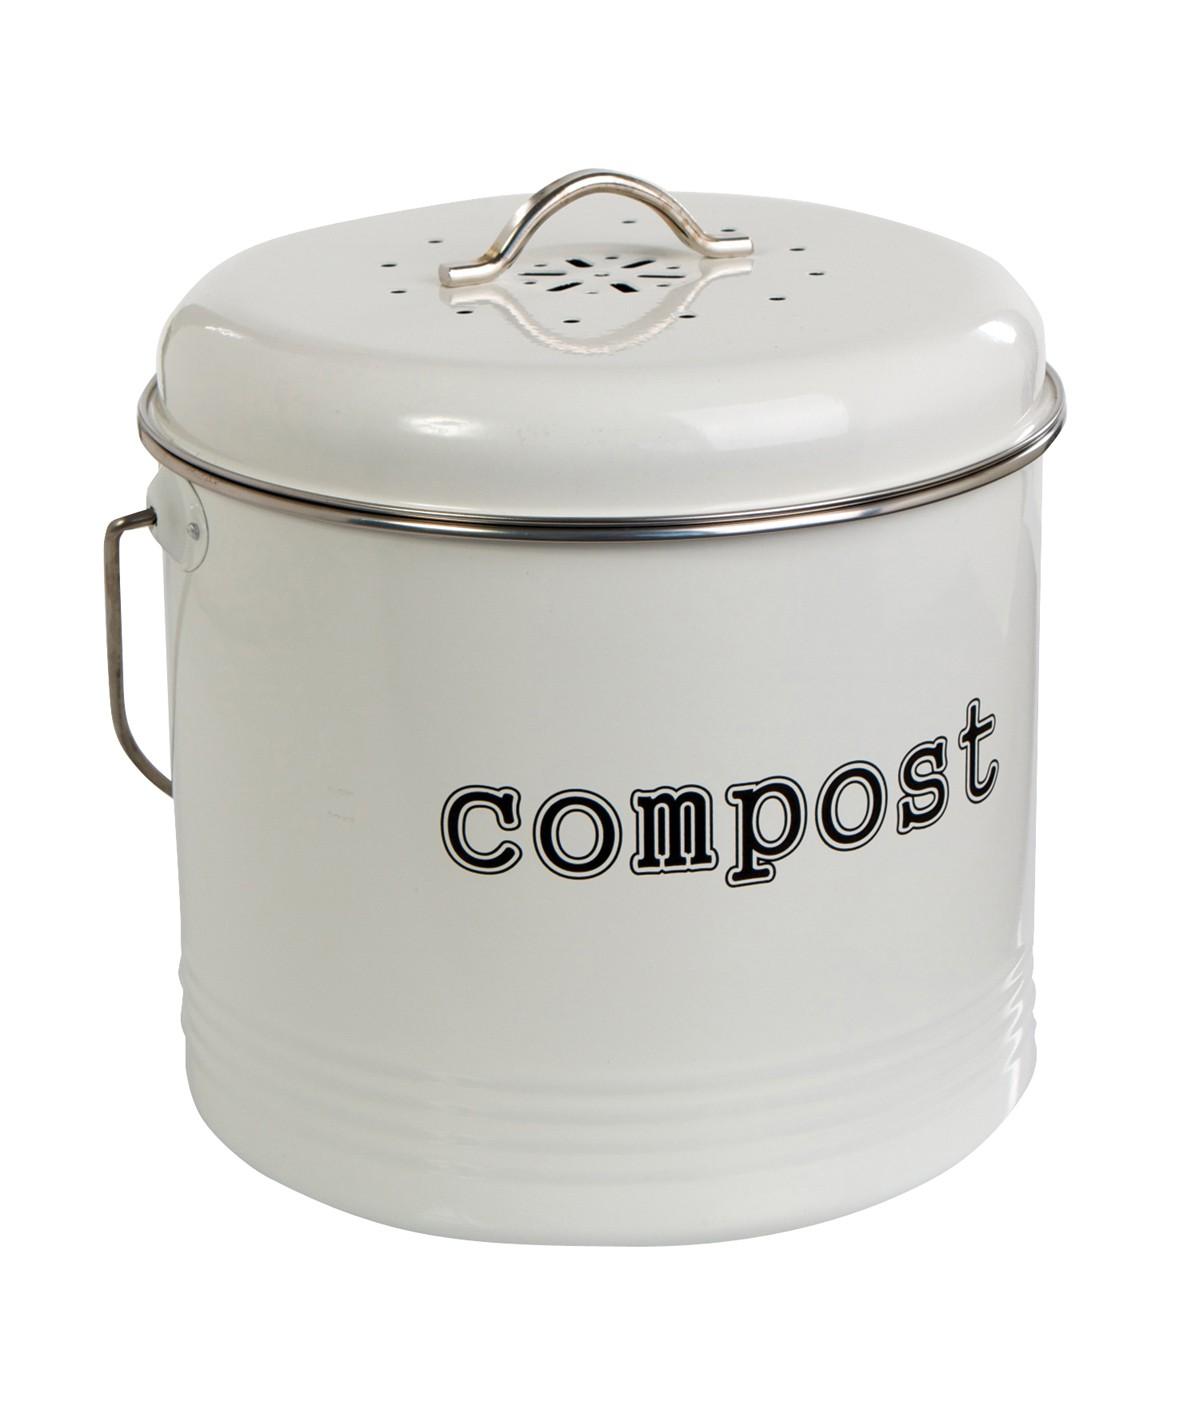 compost bin white 6 5l from storage box